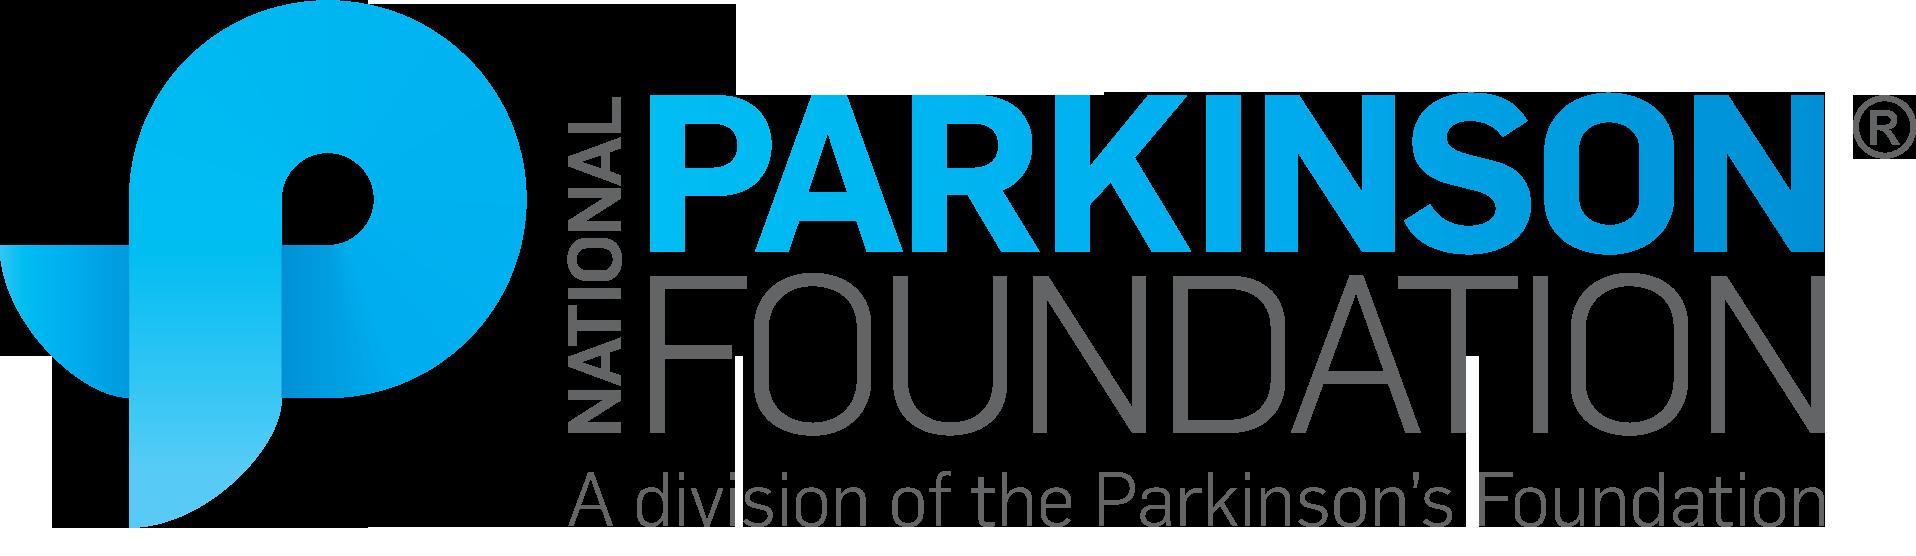 Lundbeck | National Parkinson Foundation